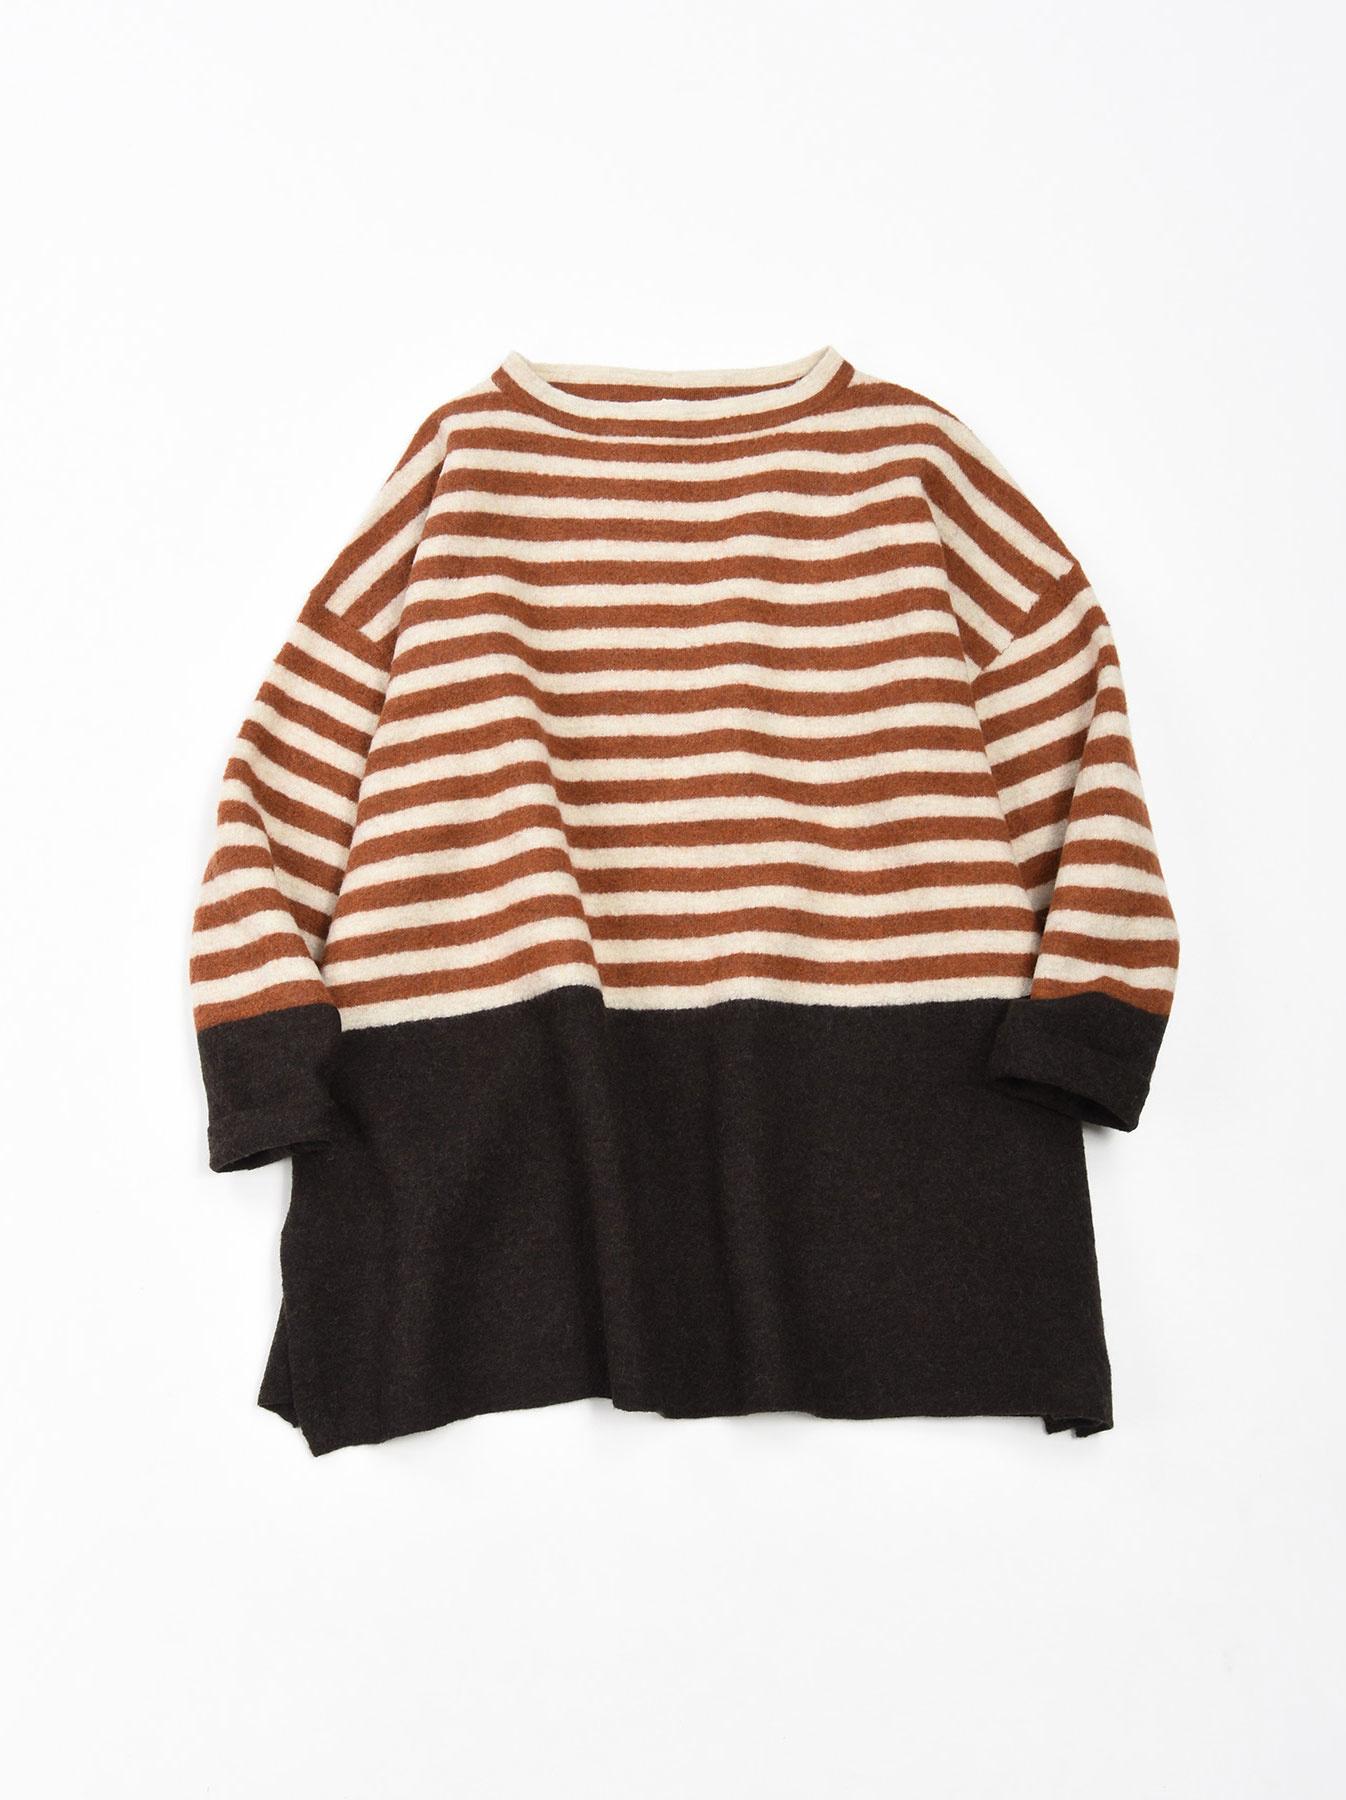 WH Arles Boiled Wool Stripe Big Tunic-3